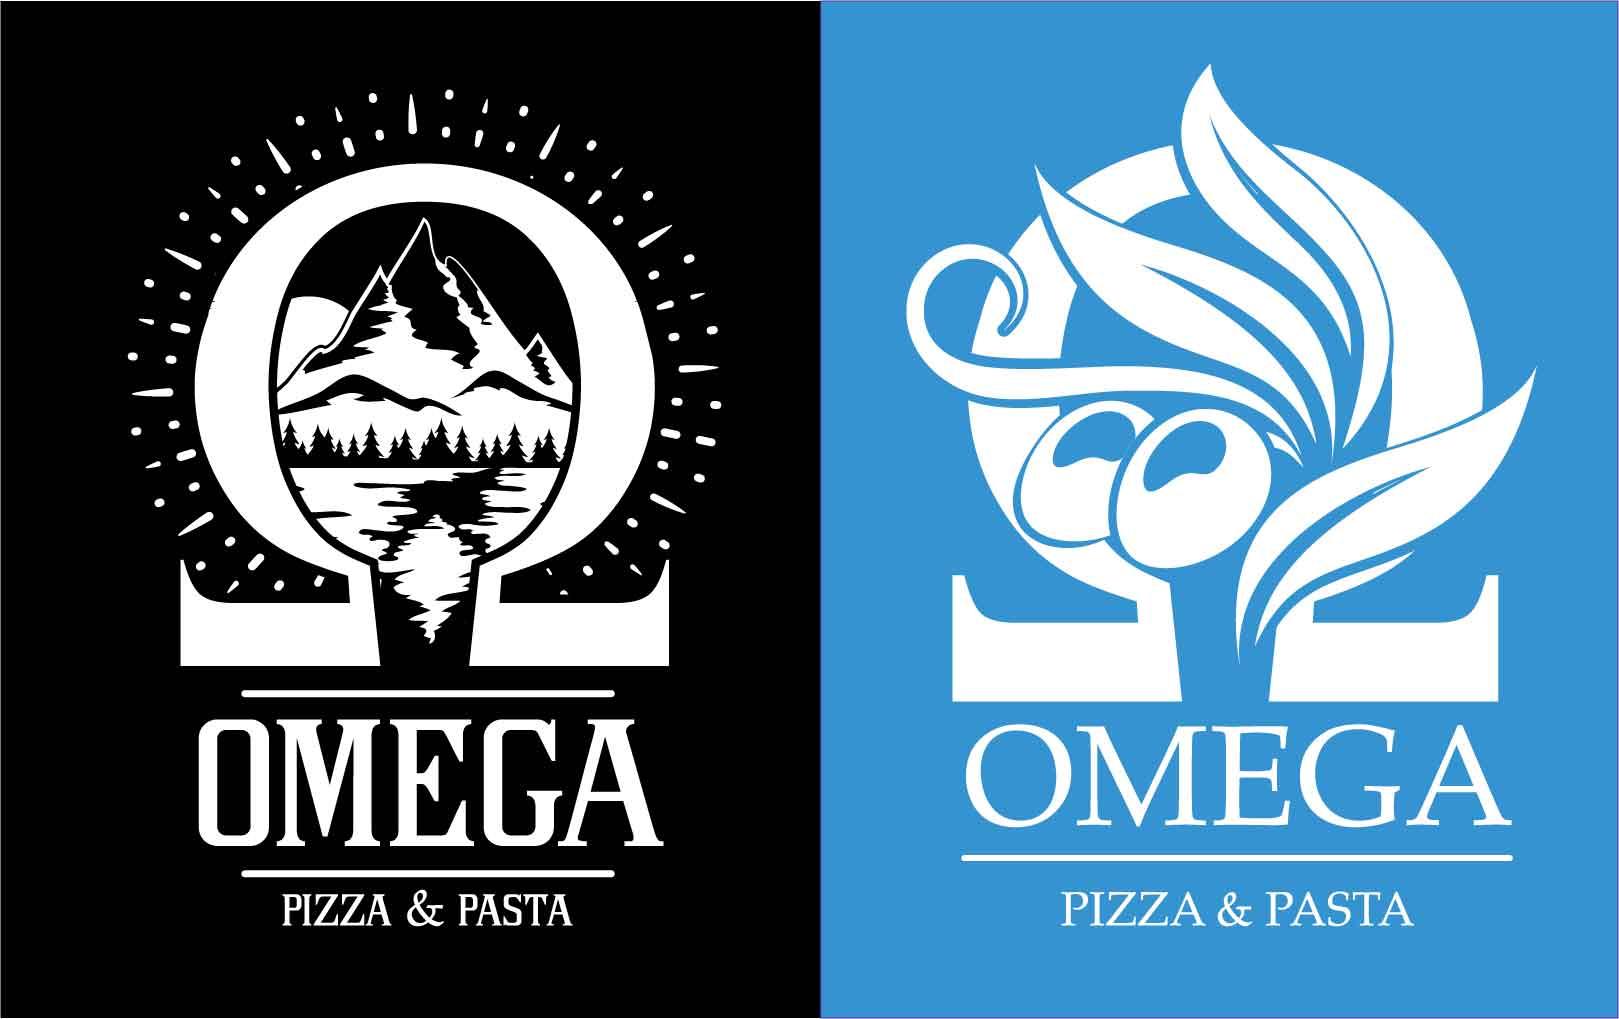 Omega Pizza & Pasta - Logos